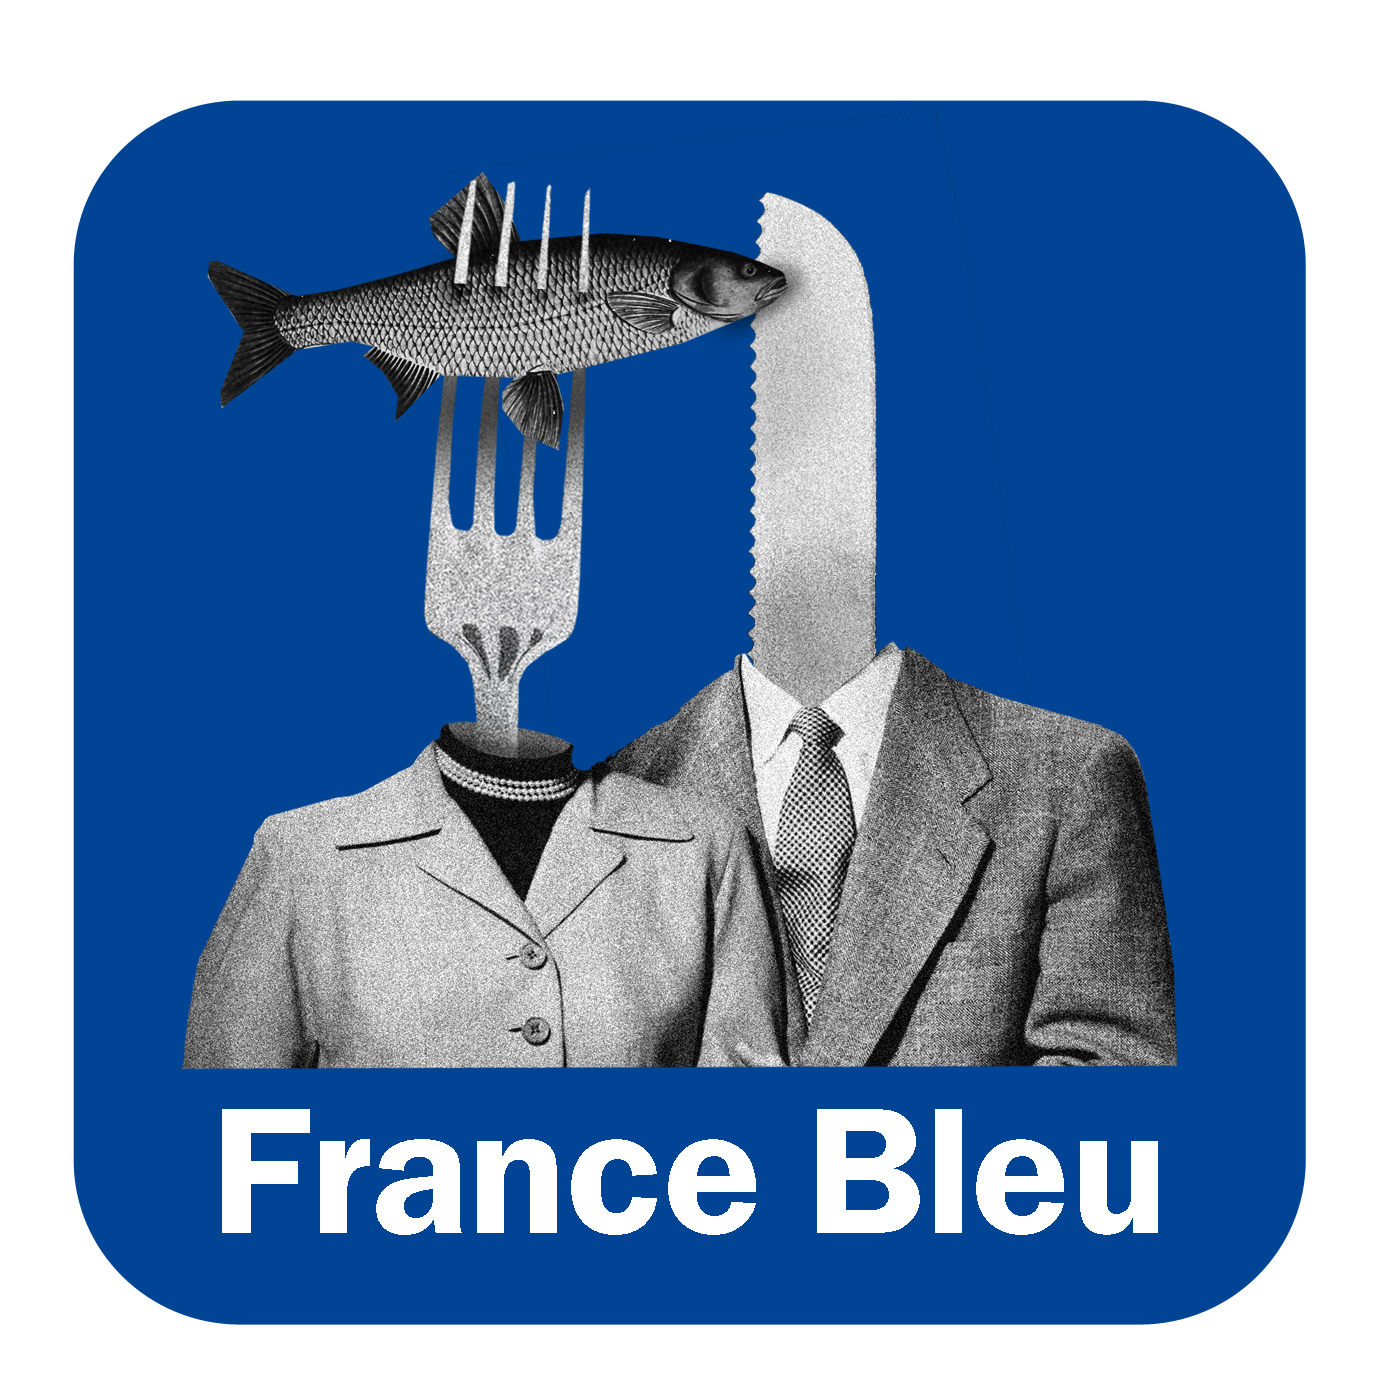 Les cordons bleus France Bleu Besançon